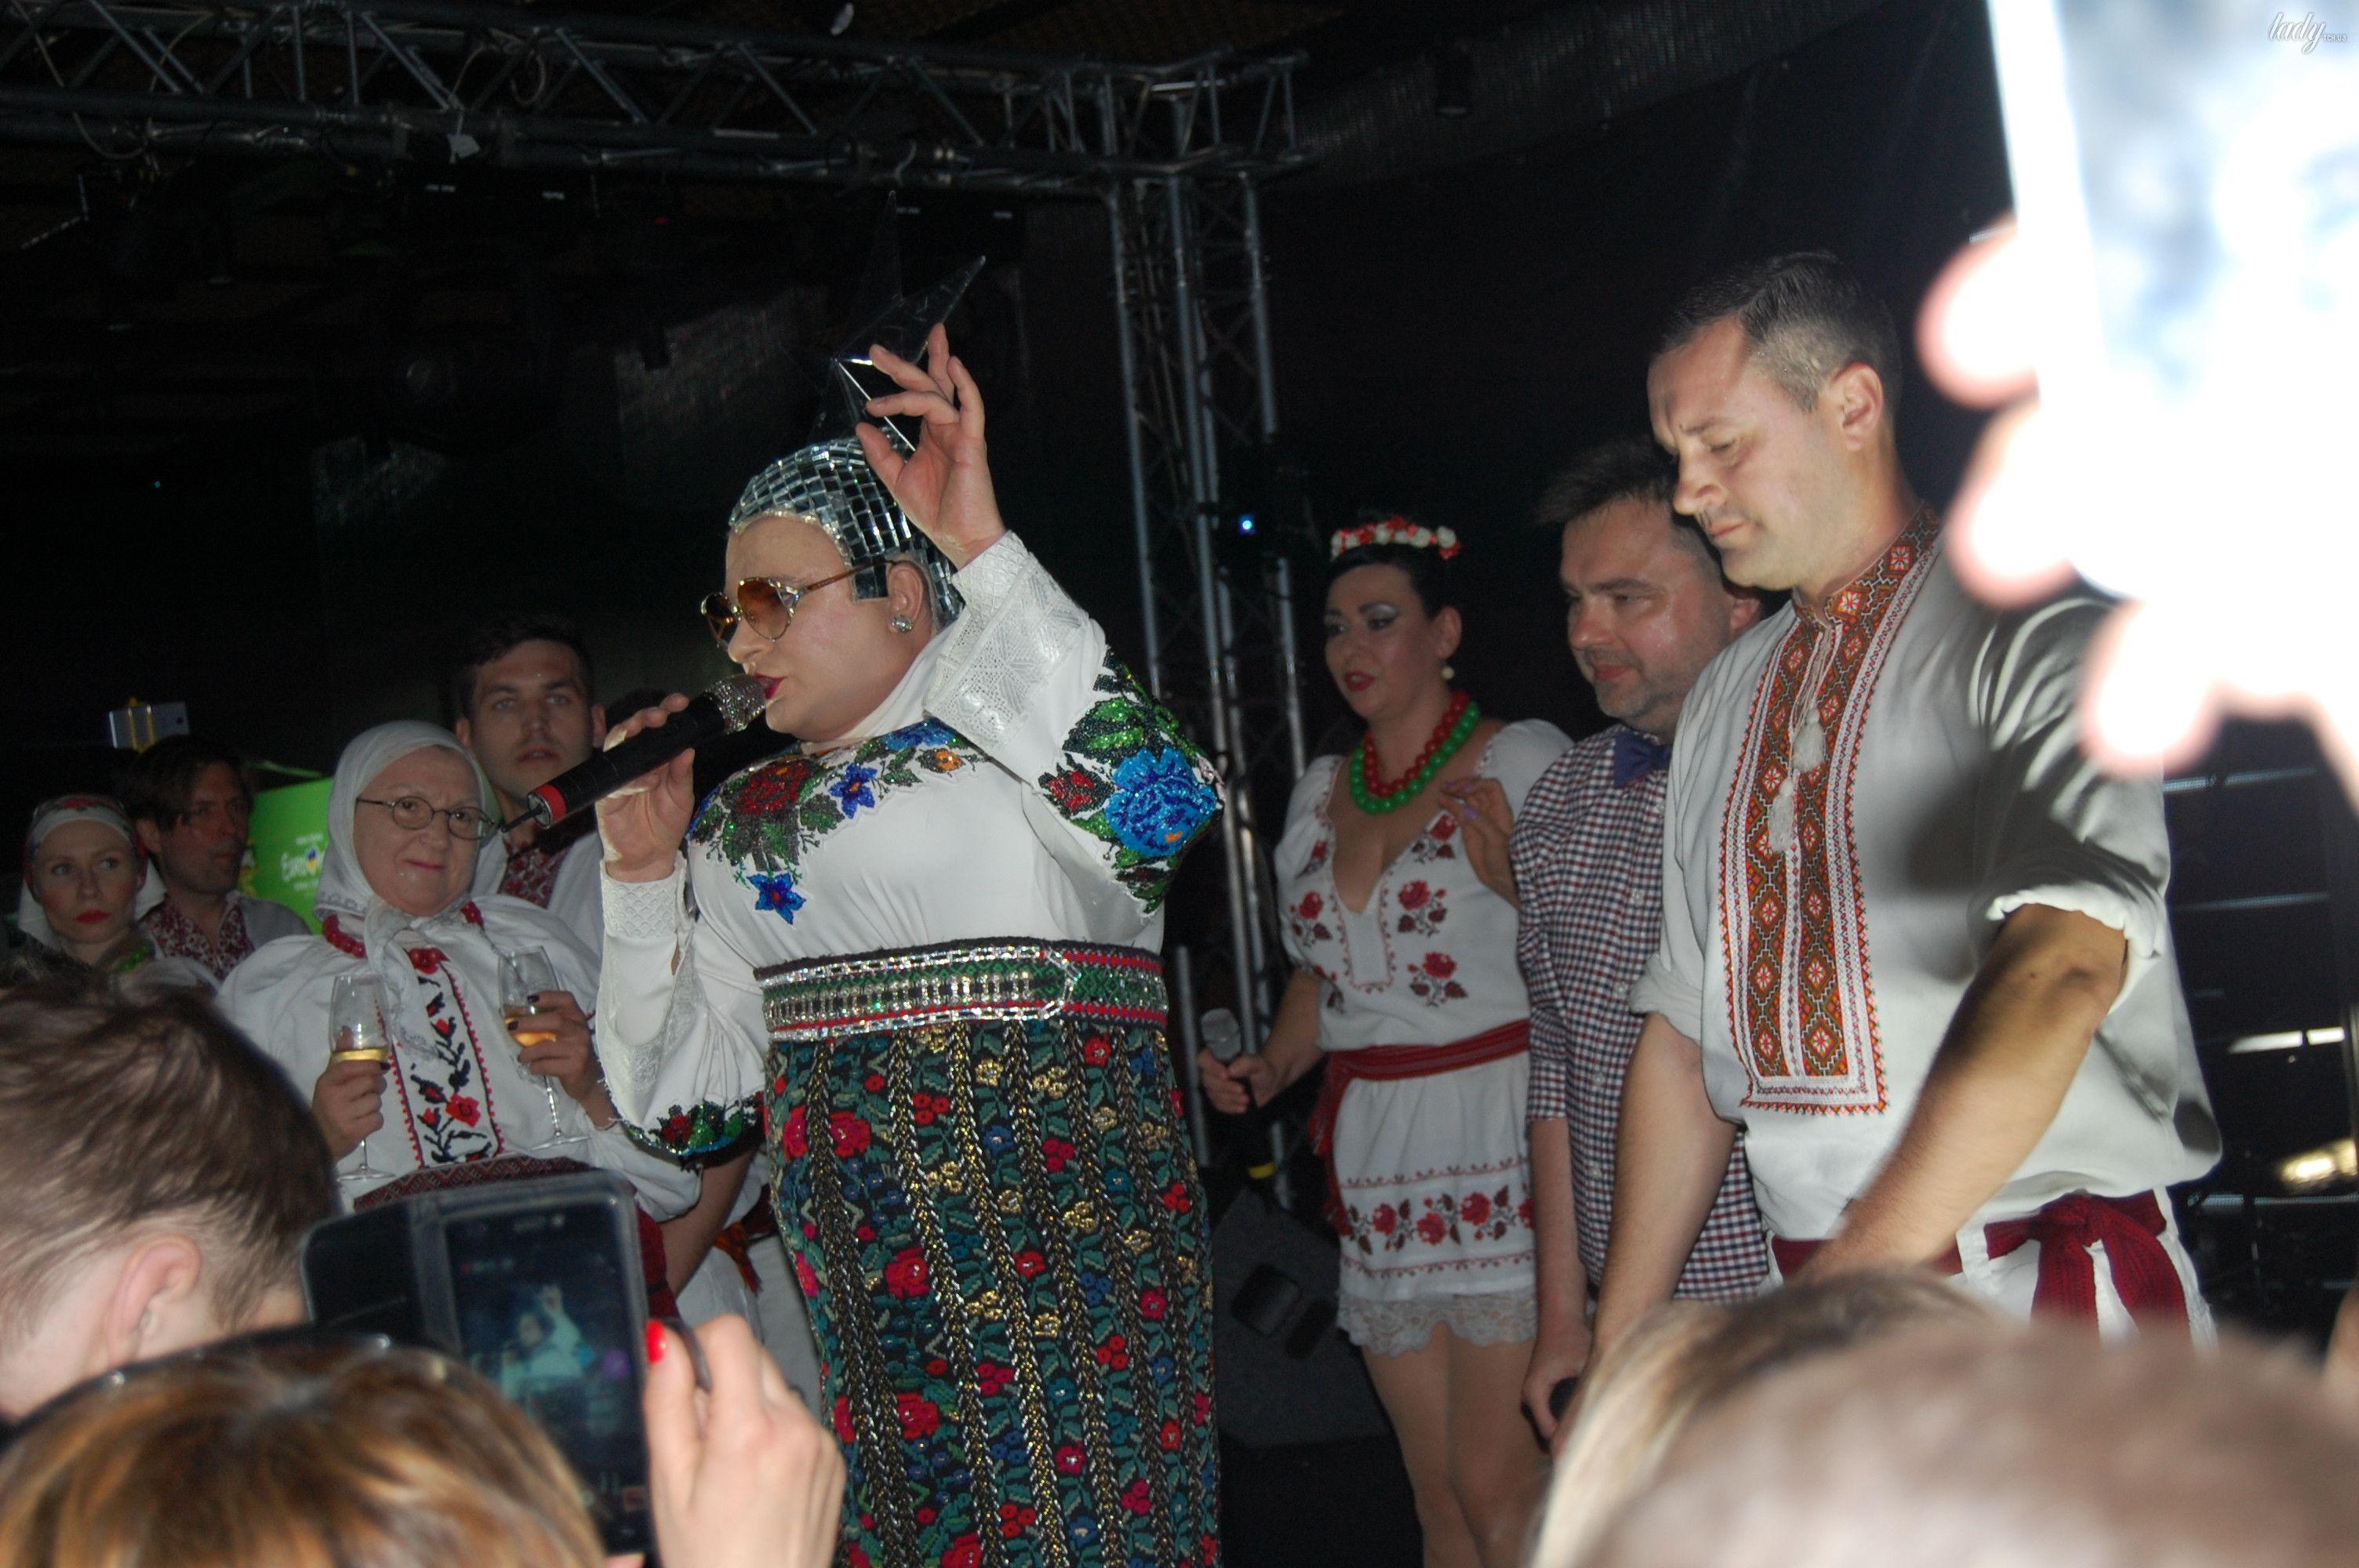 Верка Сердючка на вечеринке в EuroClub_7